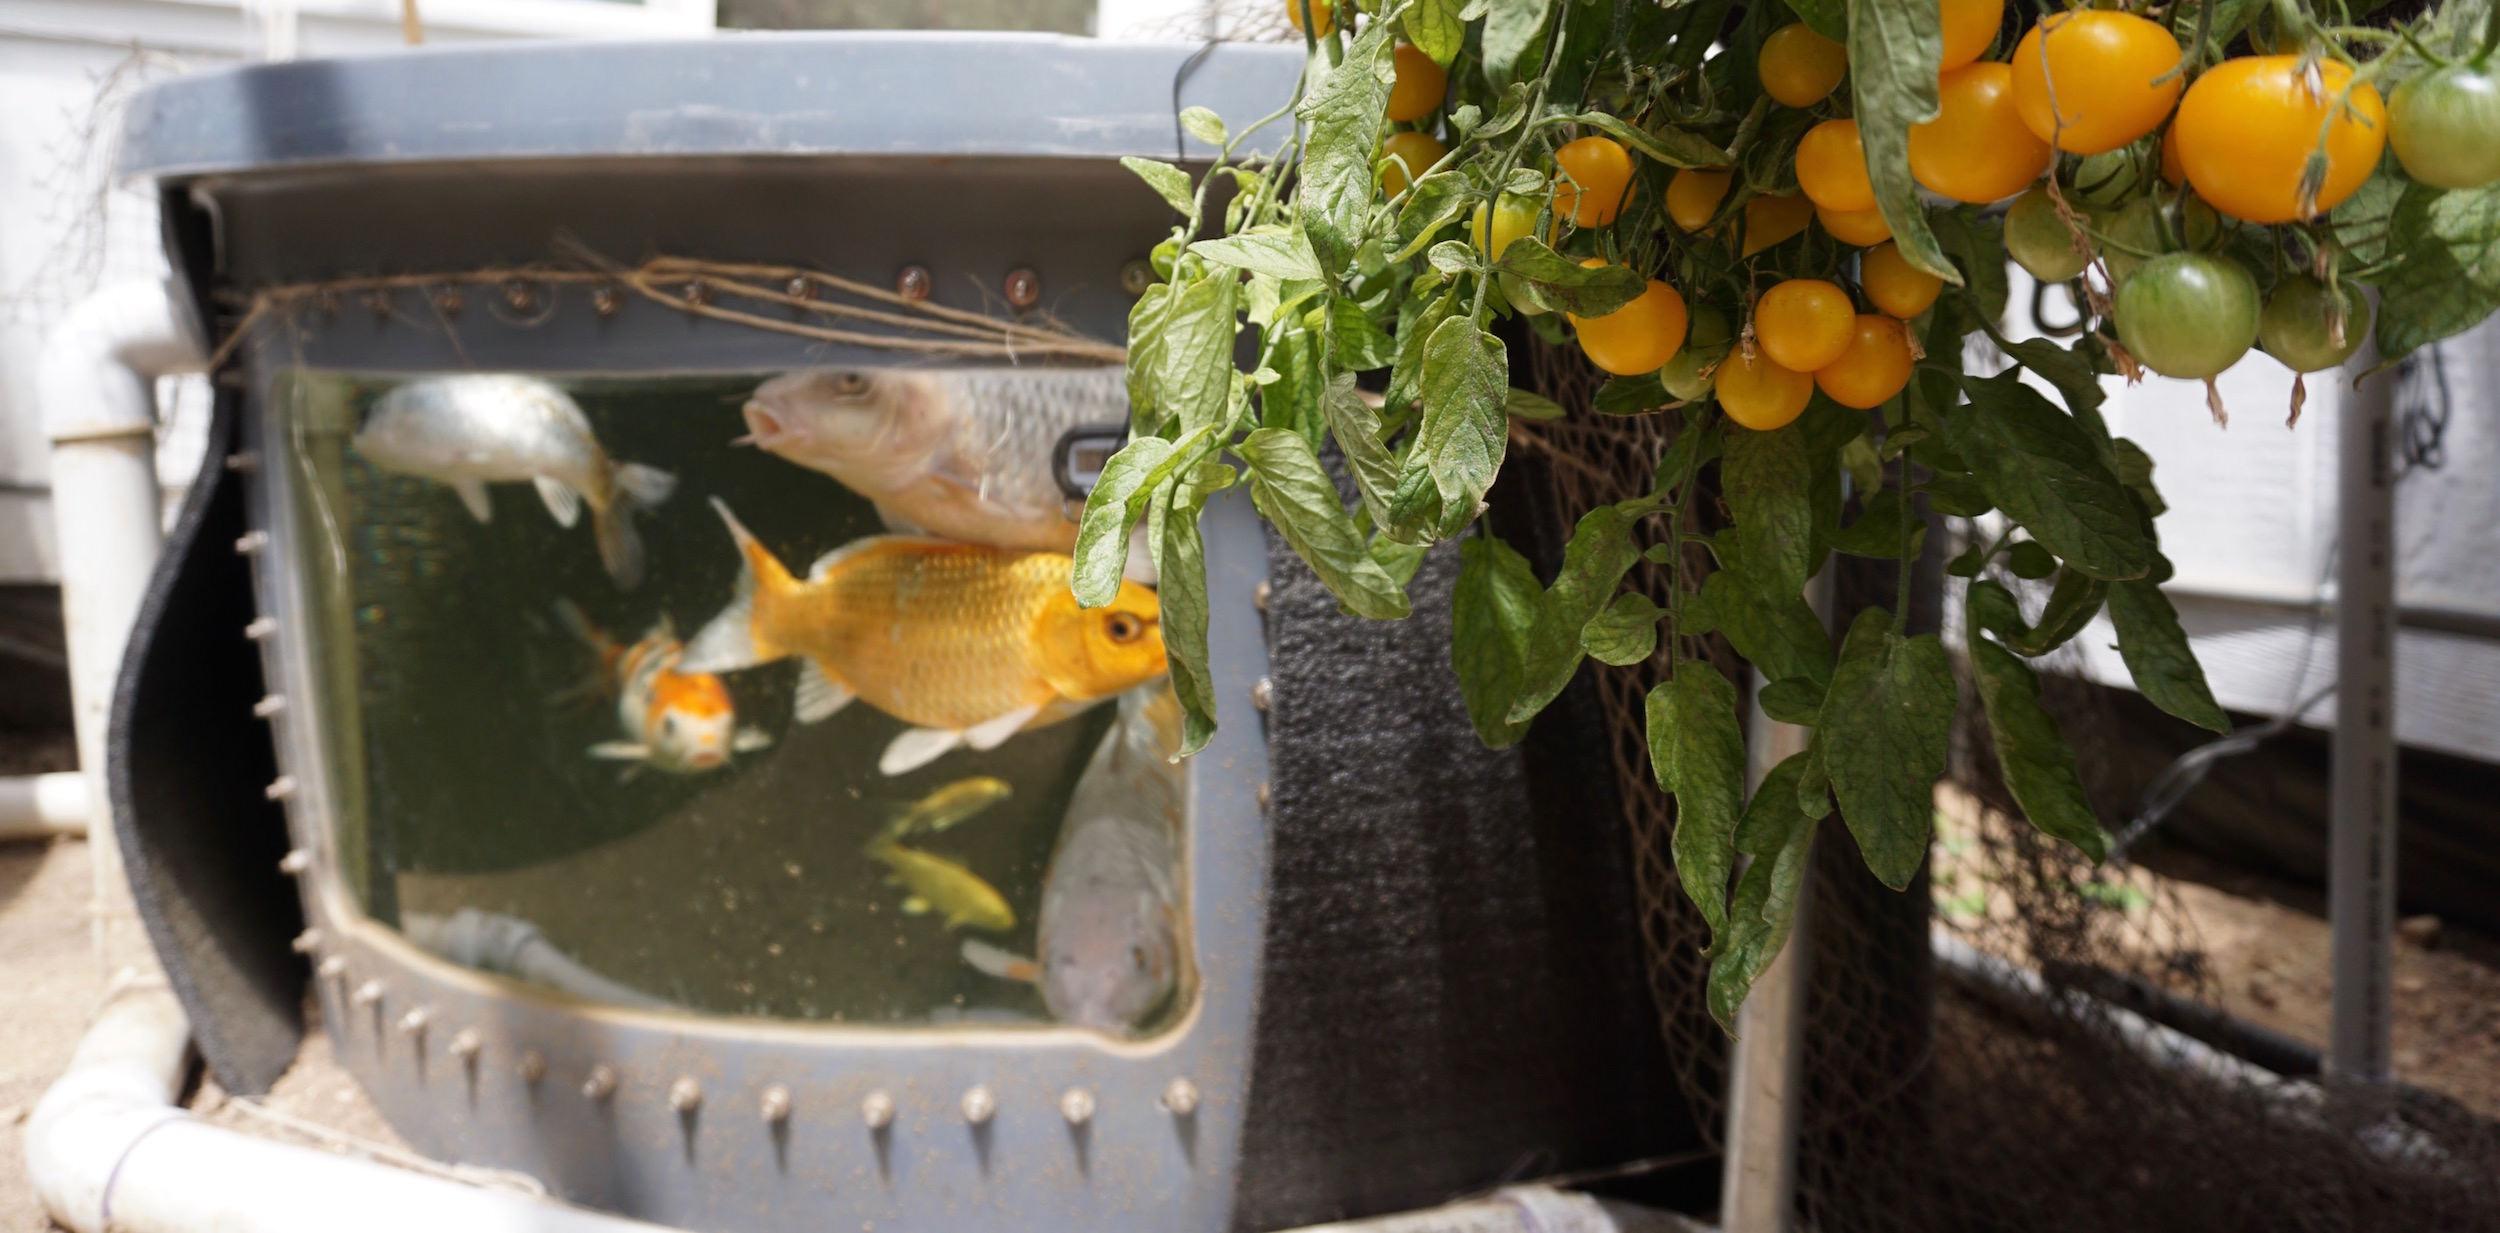 Energy-Efficient Aquaponics Greenhouses | Ceres Greenhouse on small vegetable greenhouse, small solar greenhouse, micro aquaponics greenhouse, easy aquaponics greenhouse, private aquaponics greenhouse,